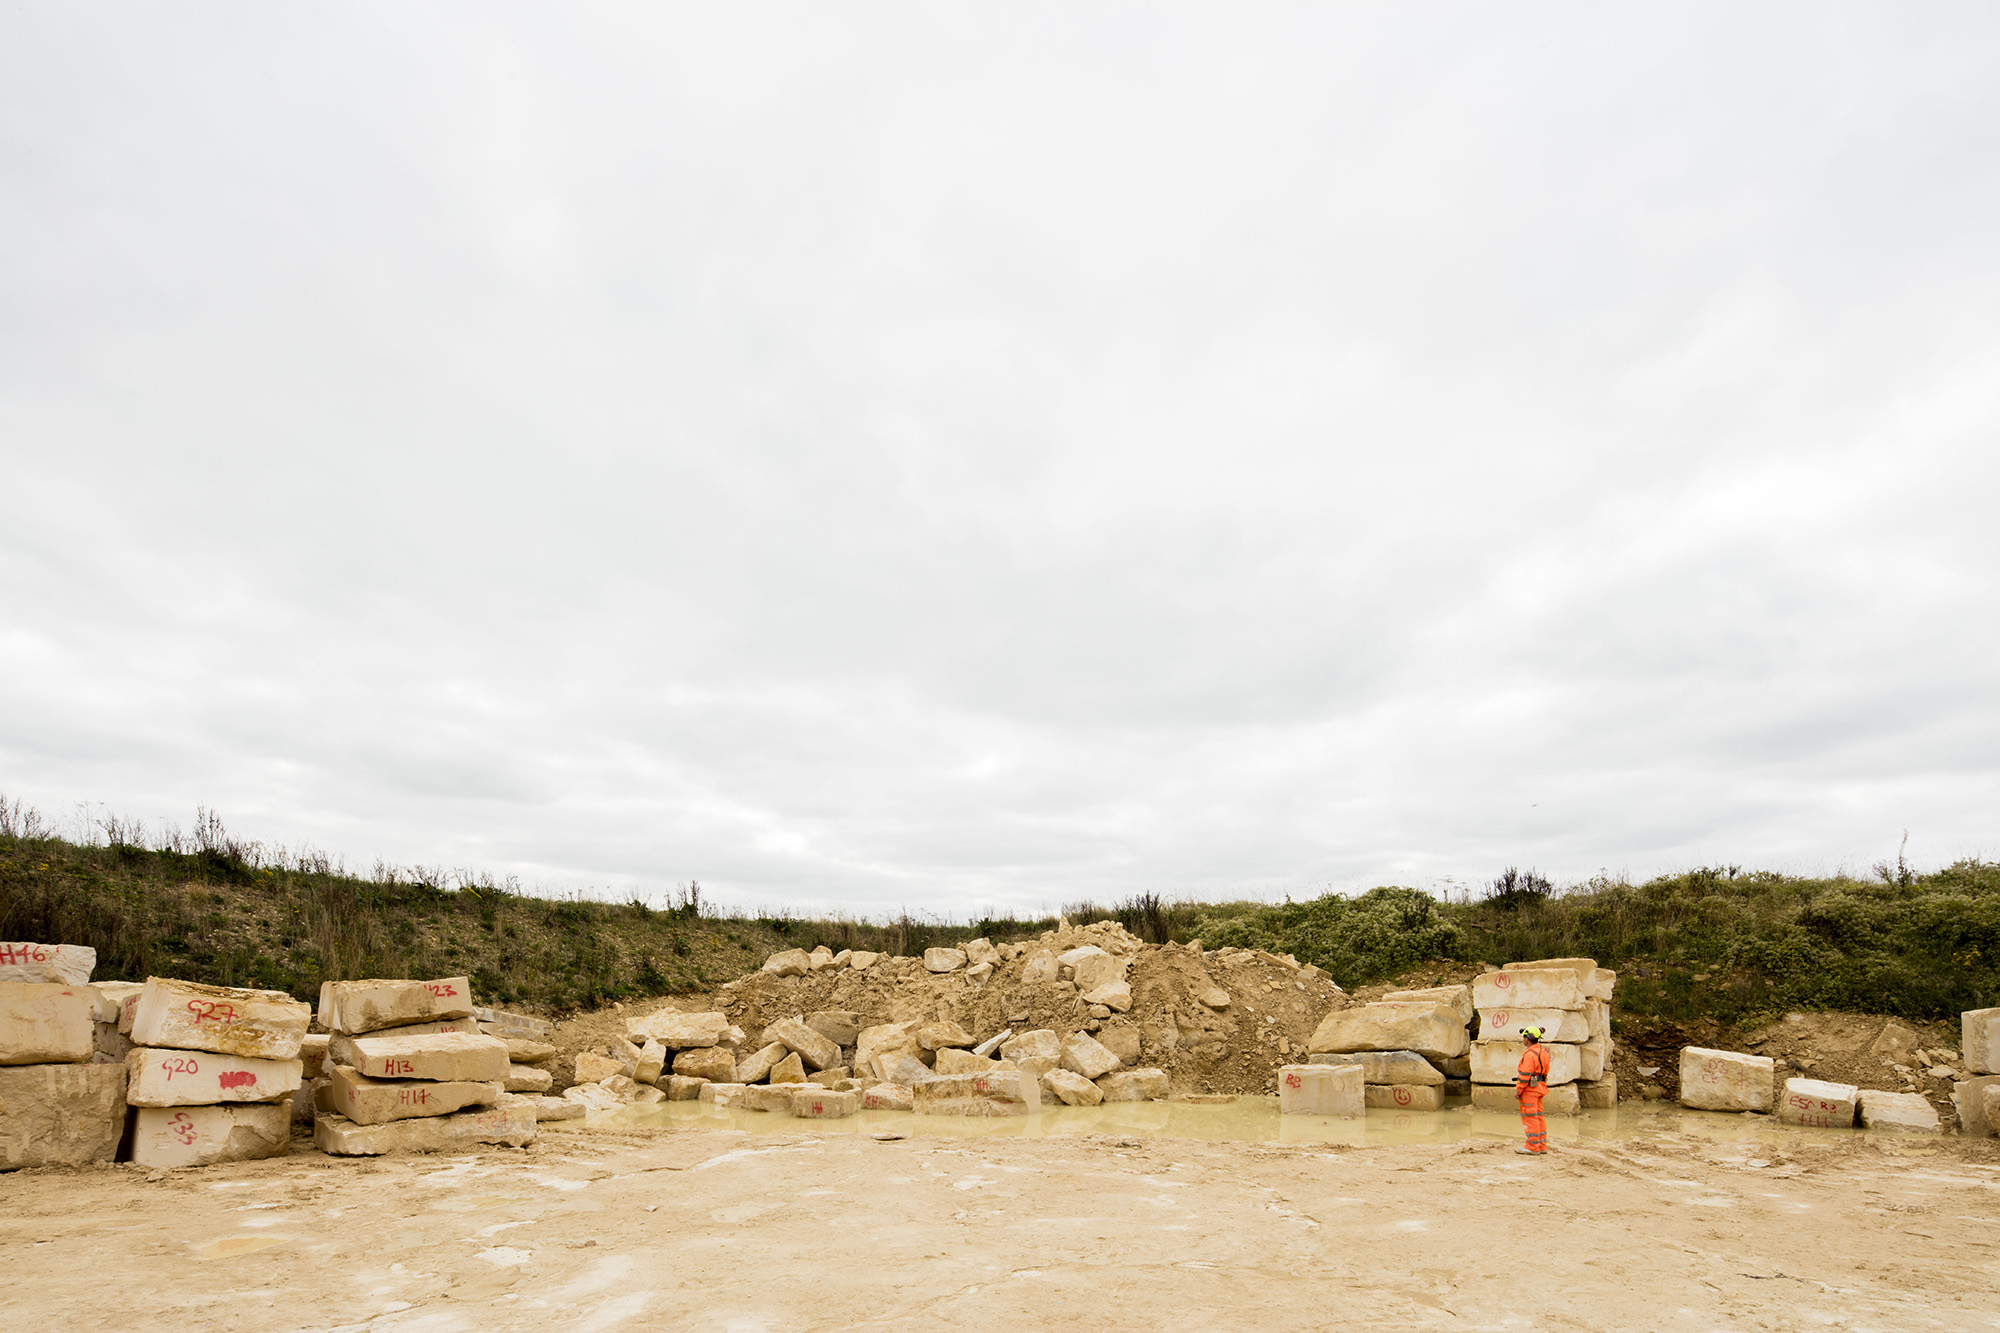 park lane mine / af jones stonemansons